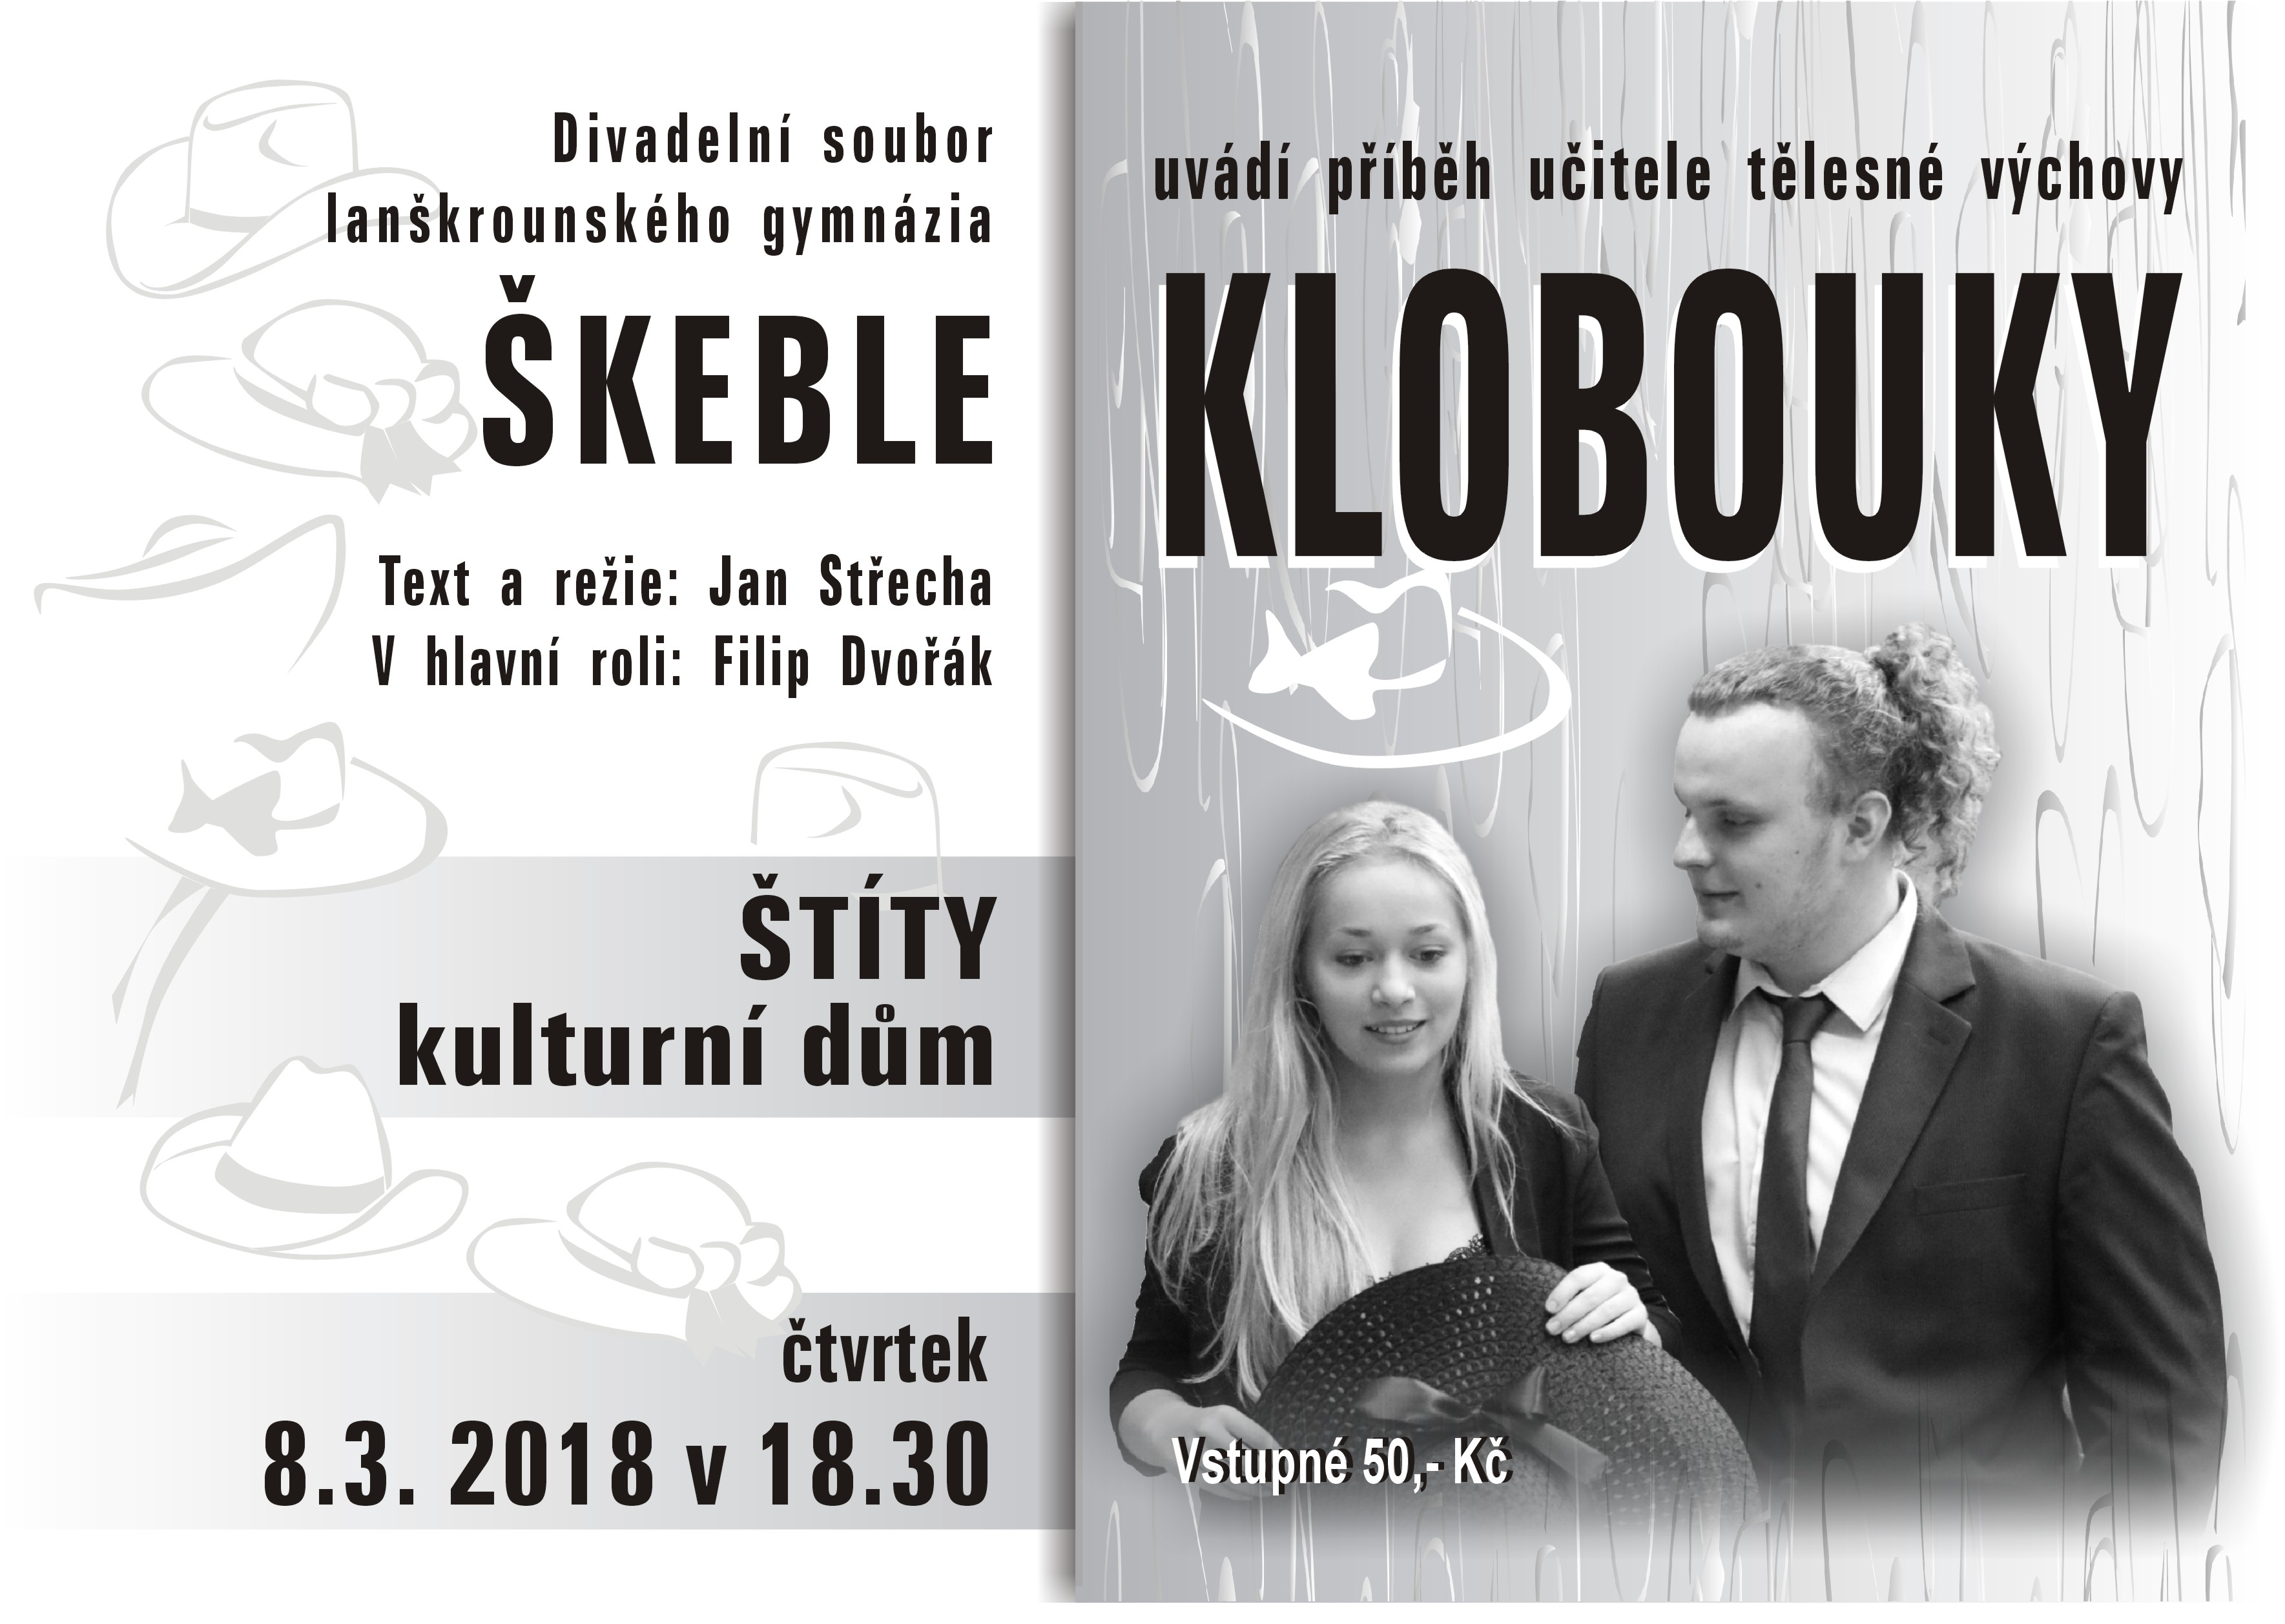 Klobouky-plakat Stity